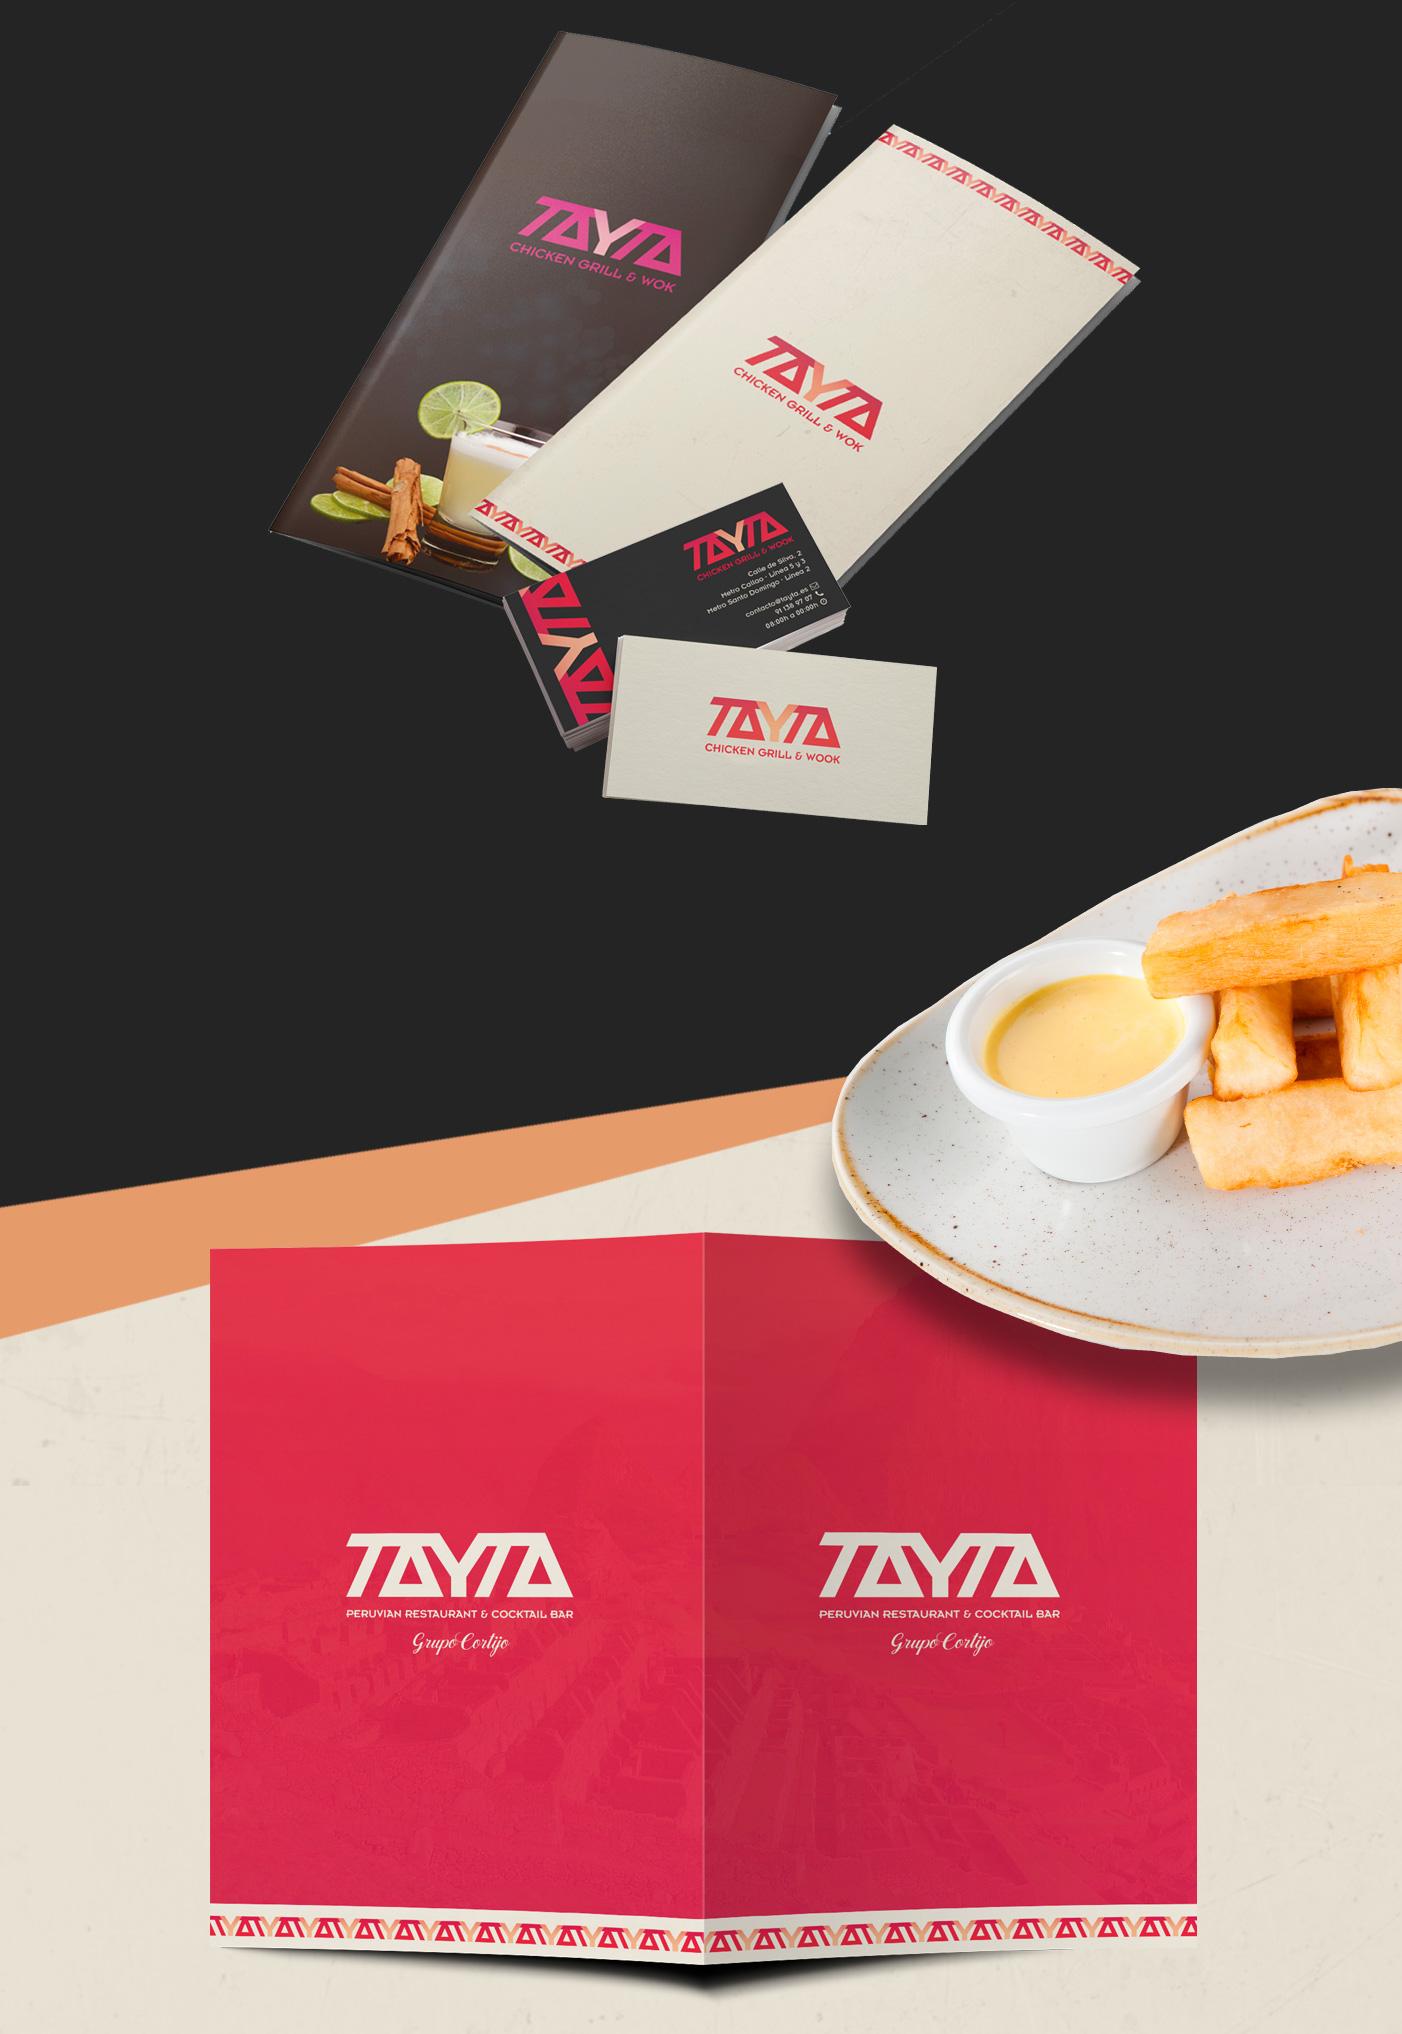 Carta Restaurante Tayta